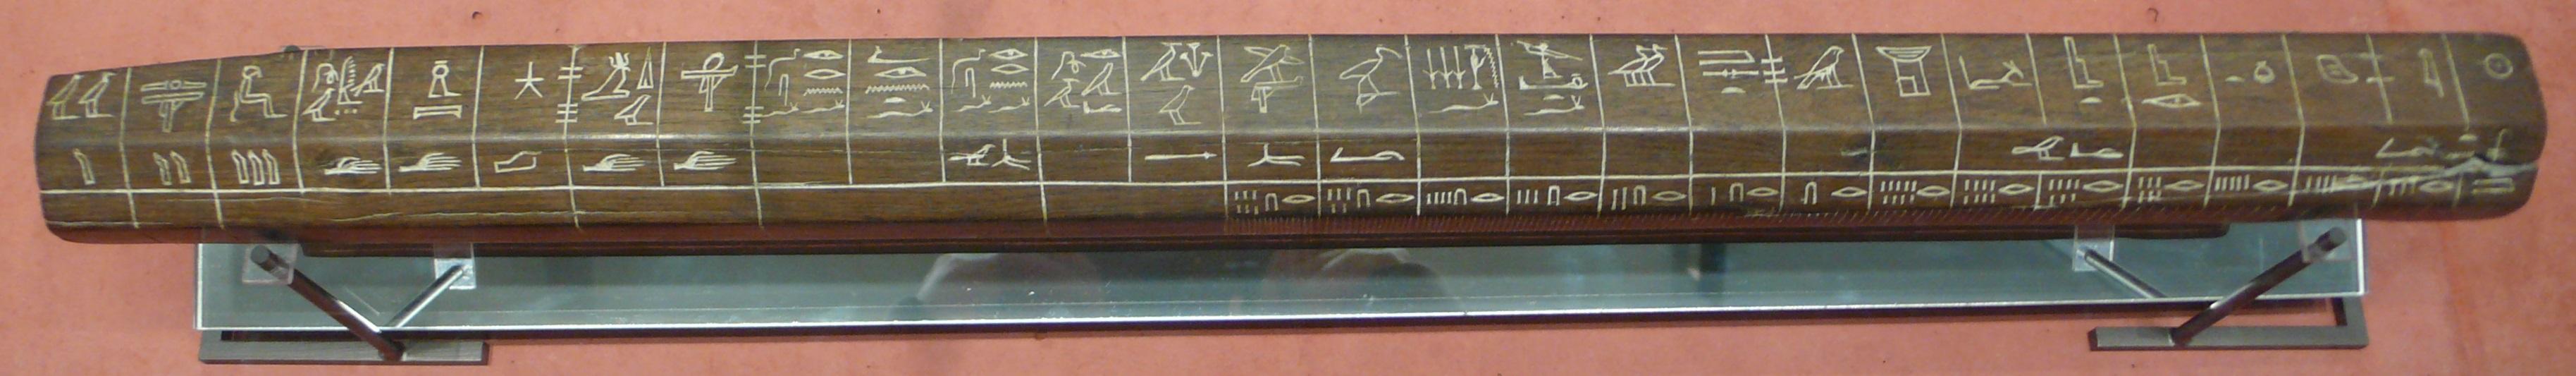 Egyptian_measuring_tool